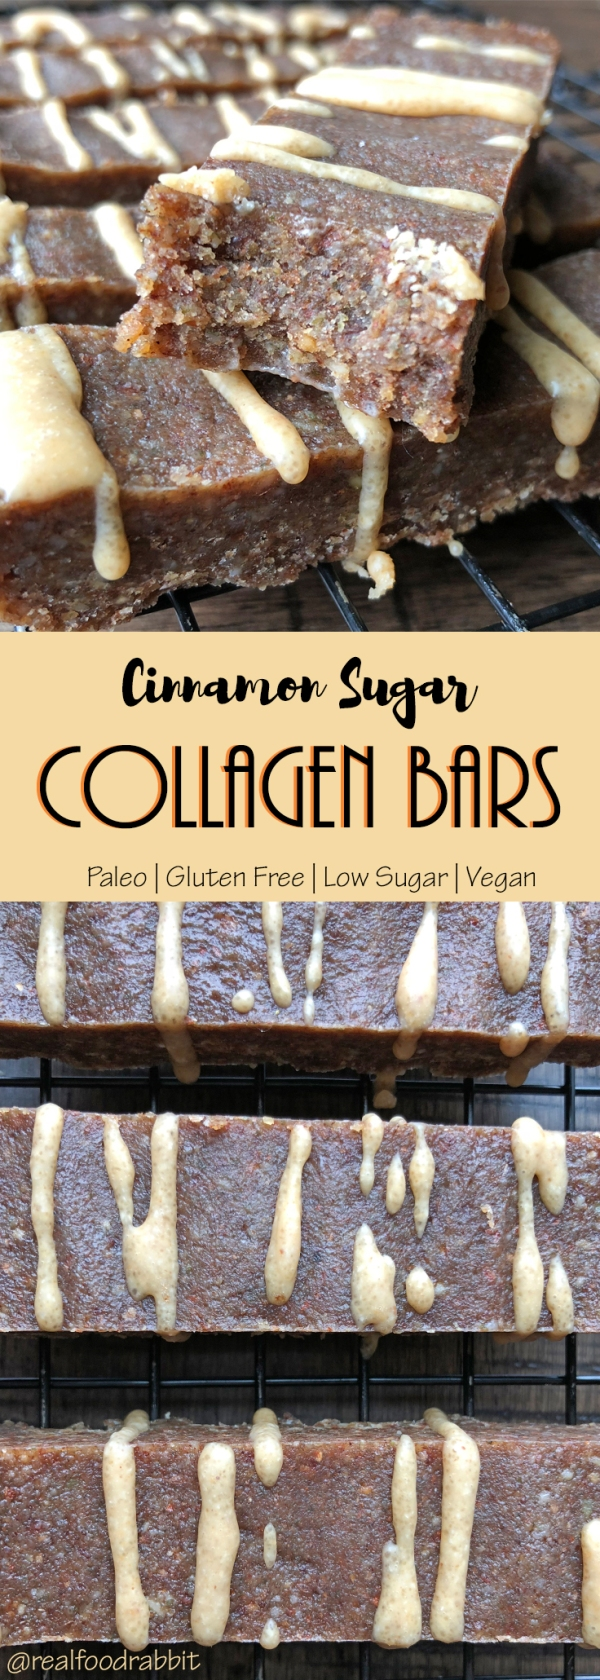 Cinnamon Sugar Collagen Bars.jpg